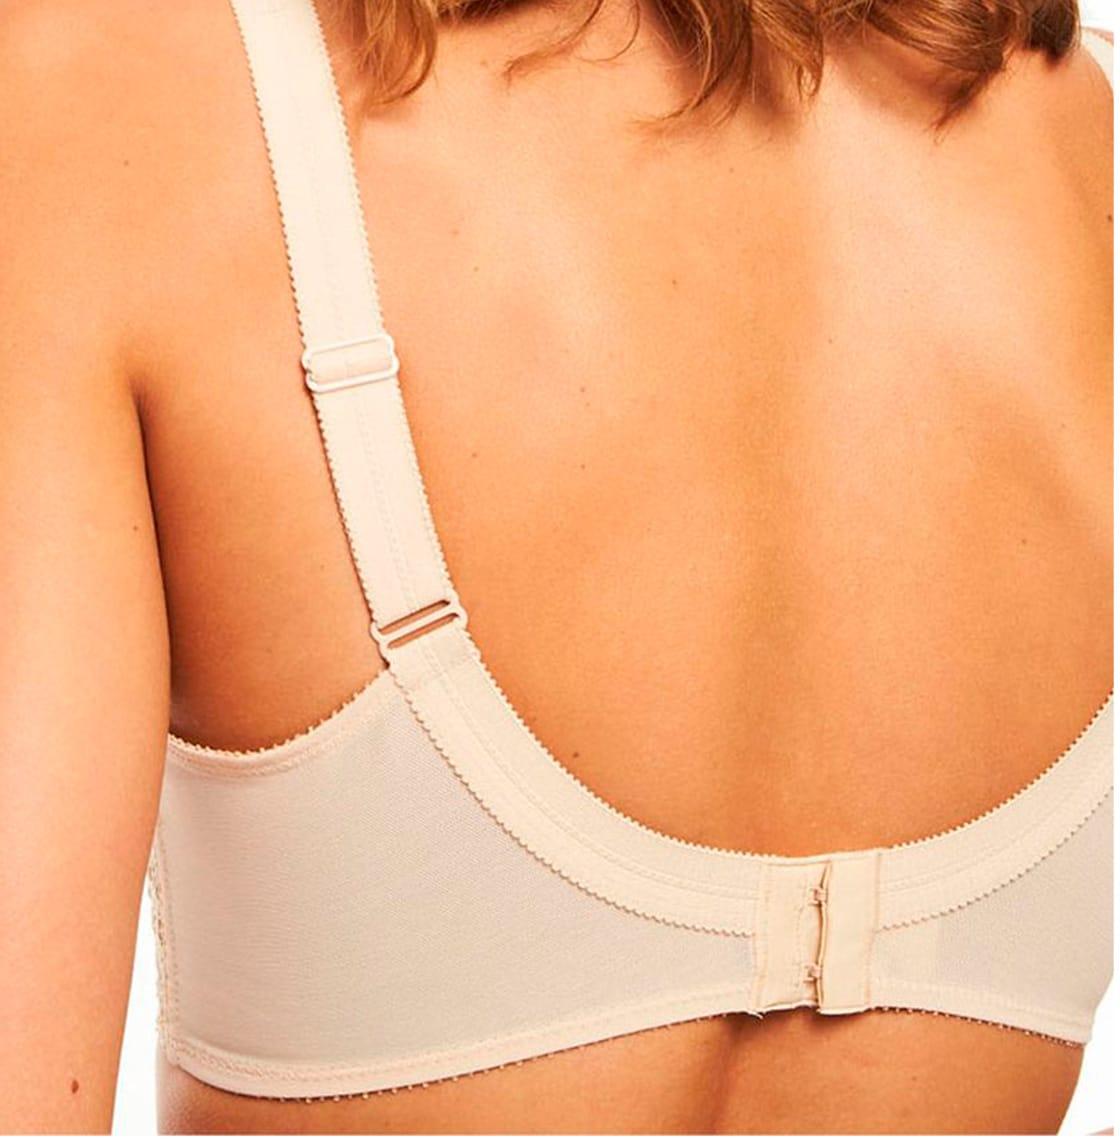 Easy-to-adjust bra